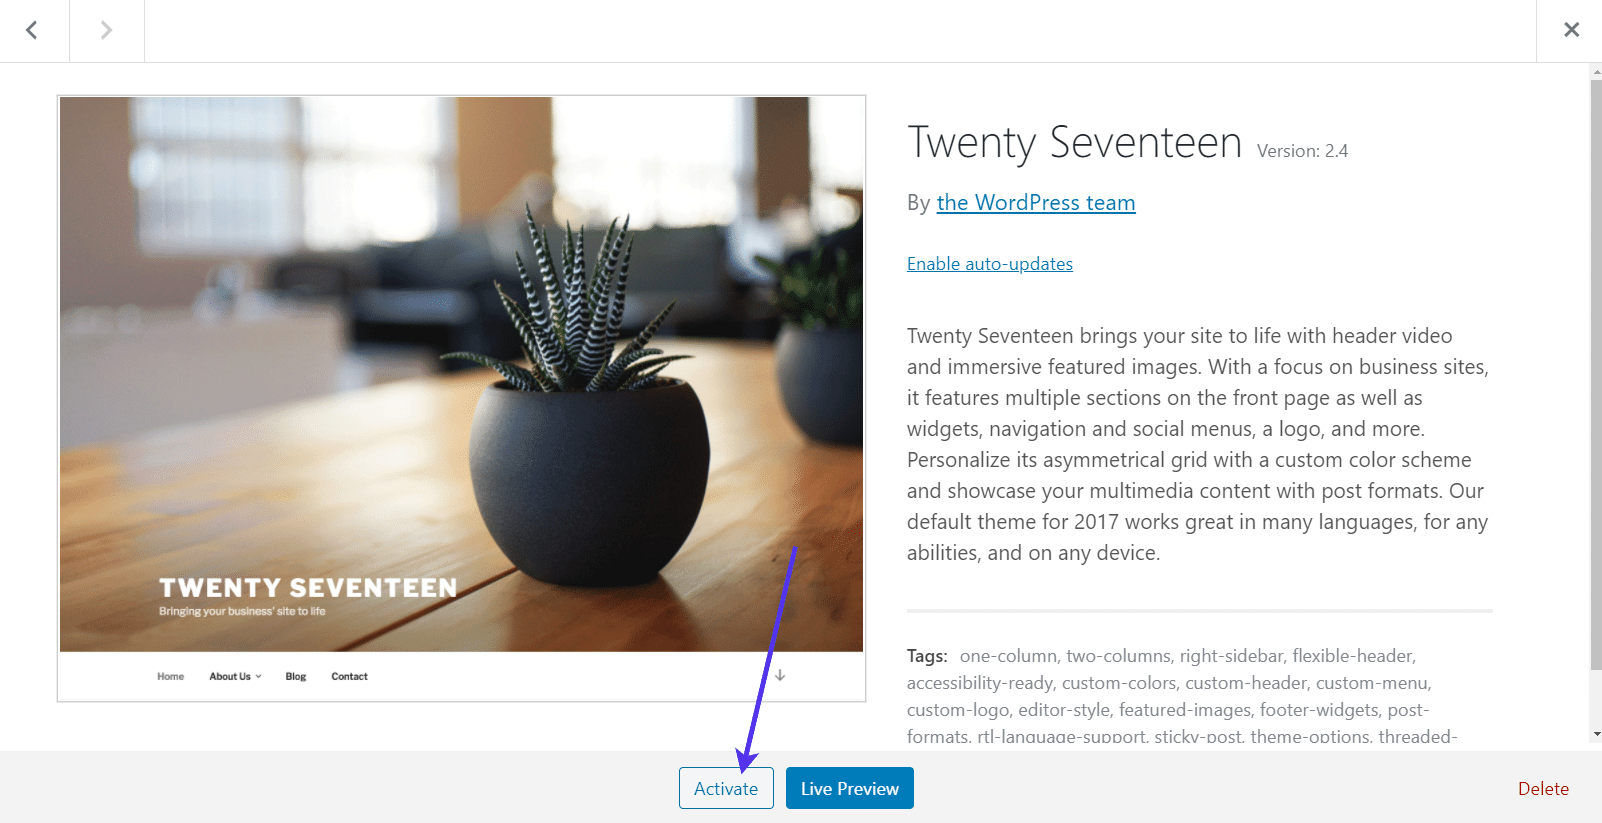 Activating a WordPress theme